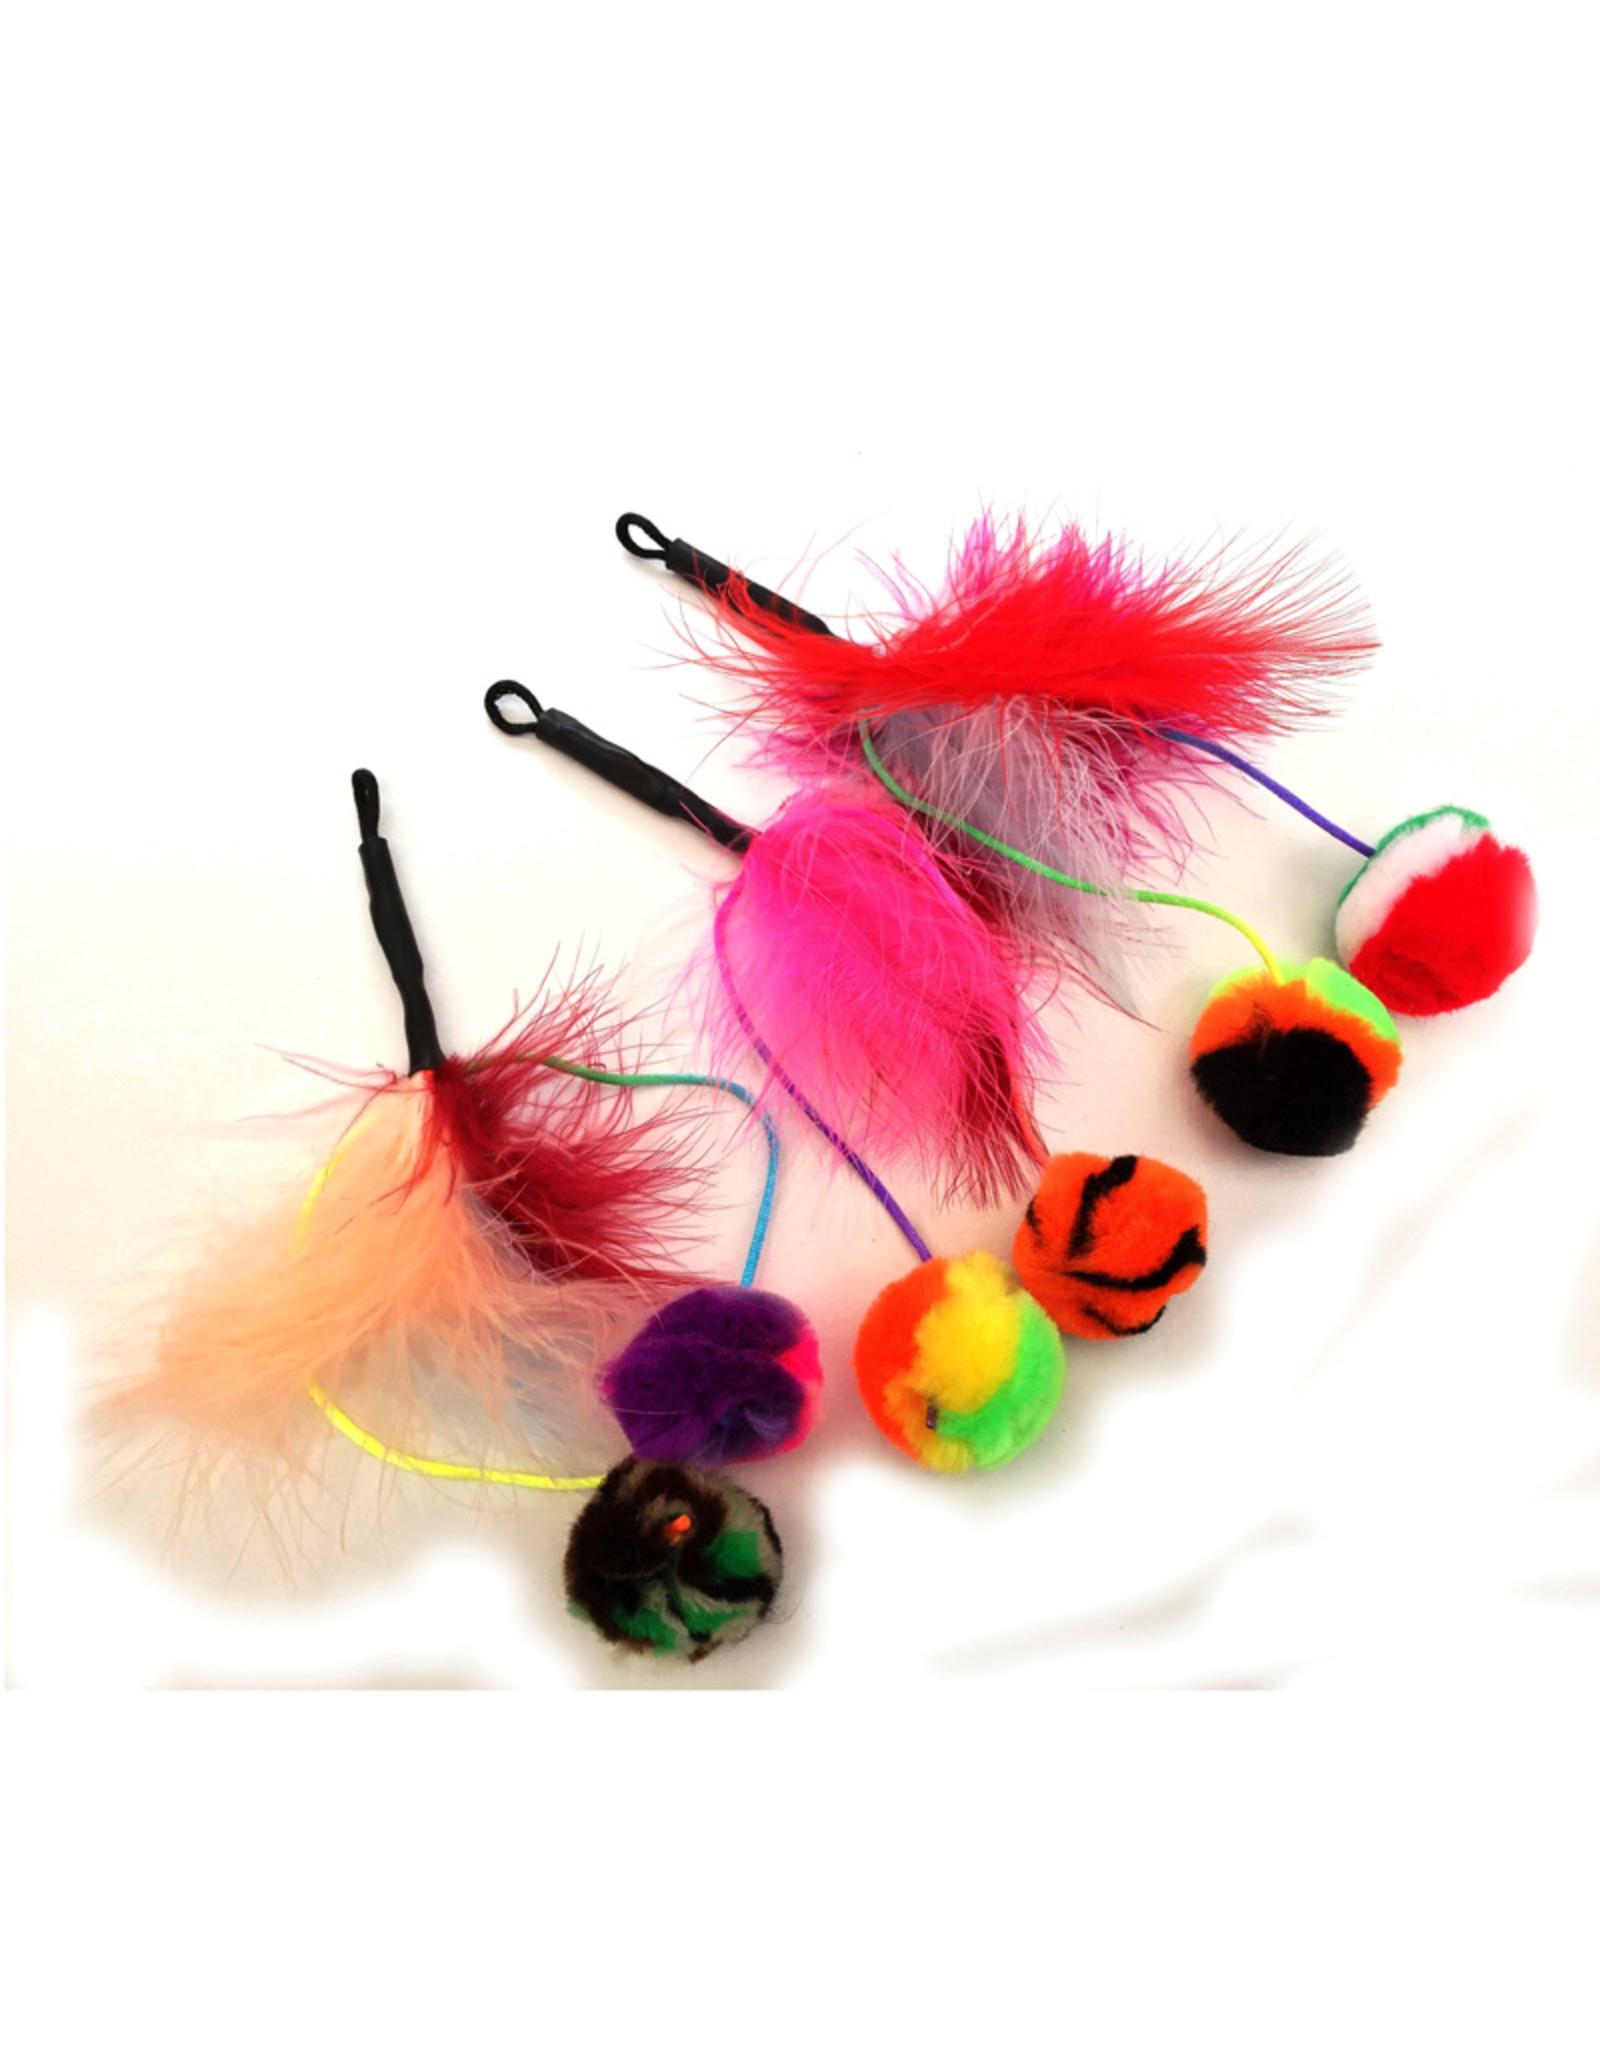 Purrs Feather Pomz - verenpompons